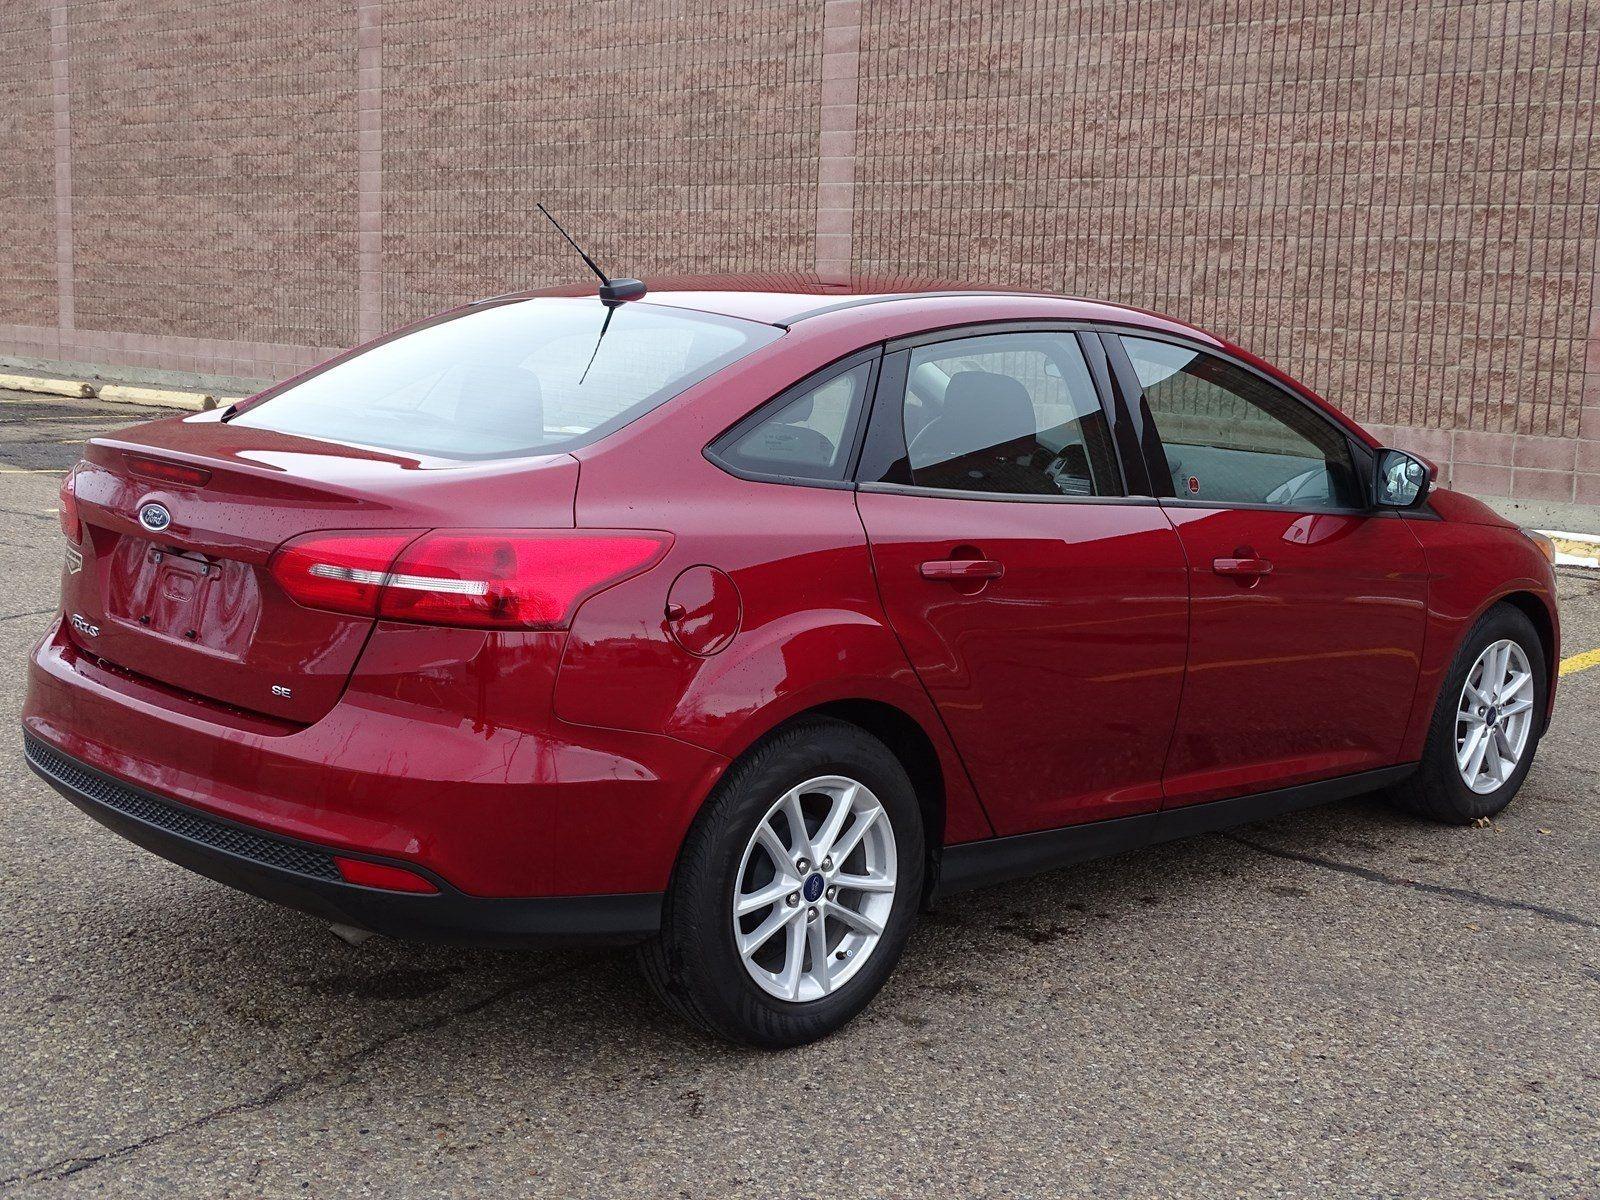 Cars For Sale Under 10000 Edmonton Elegant Edmonton Used Vehicles